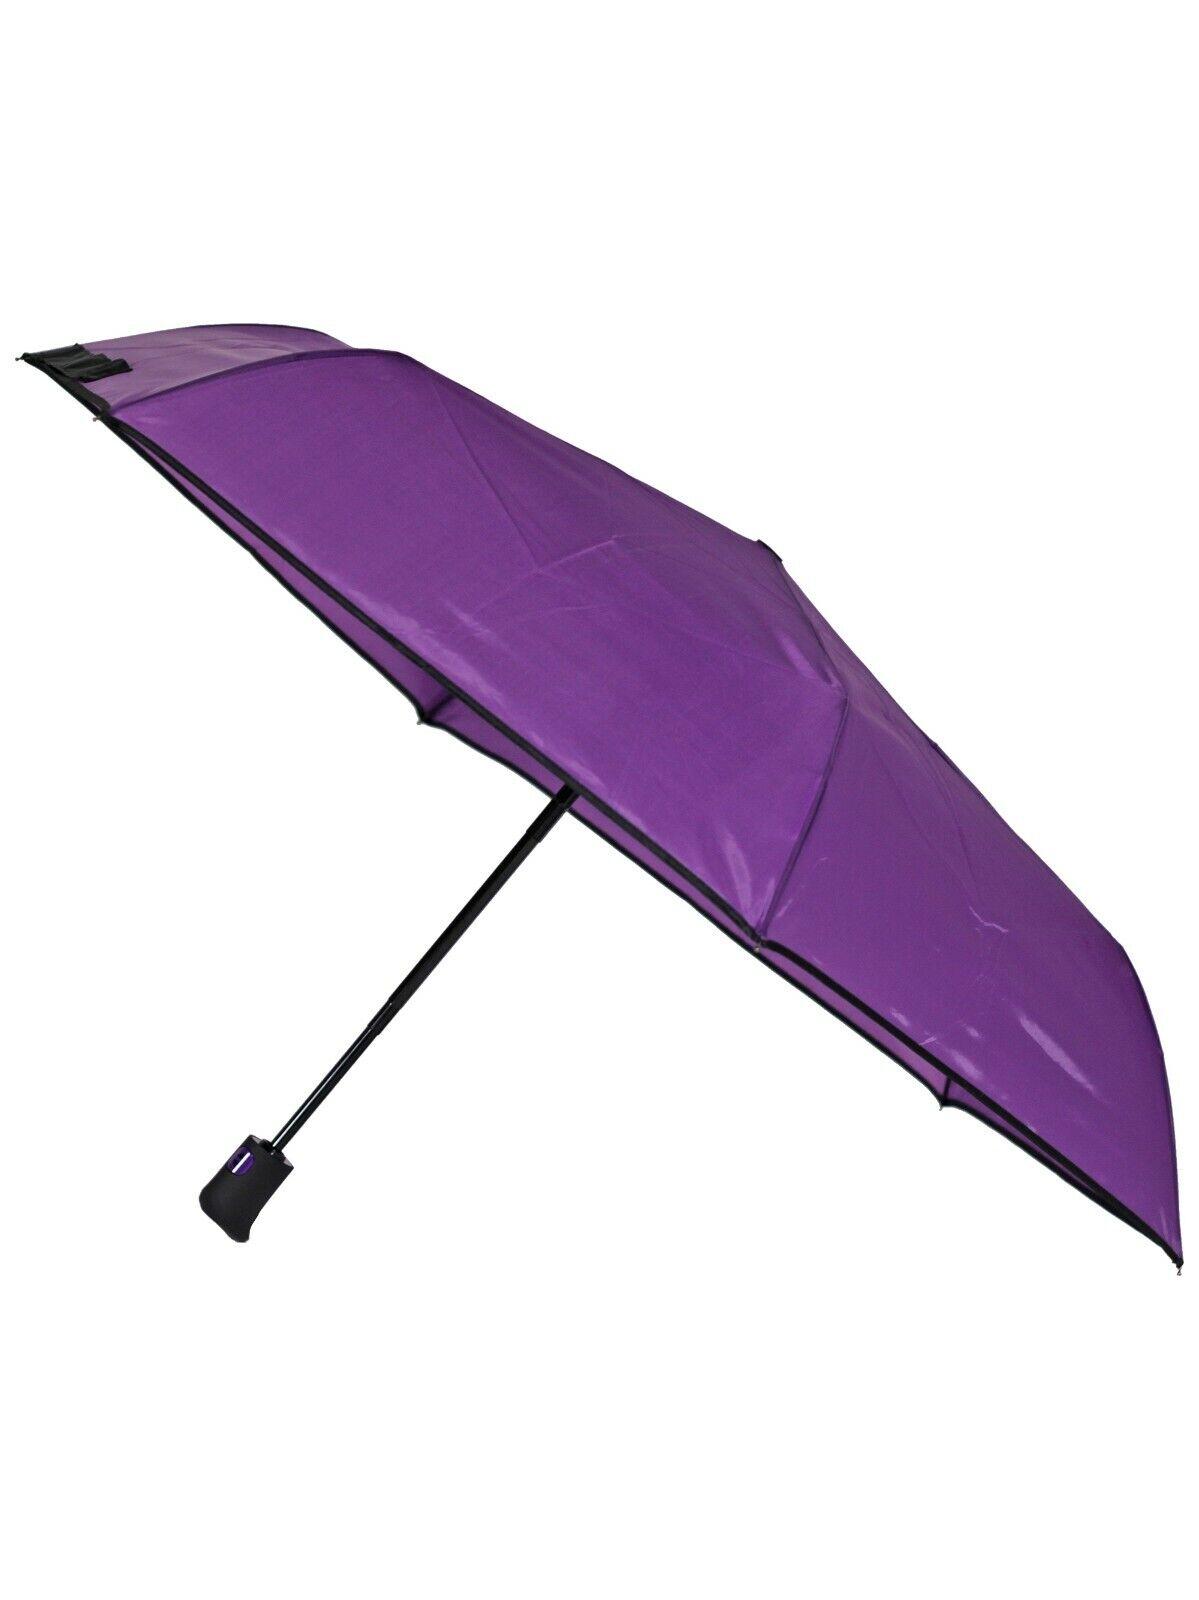 Misty Harbor Ladies Automatic Open Umbrella 42